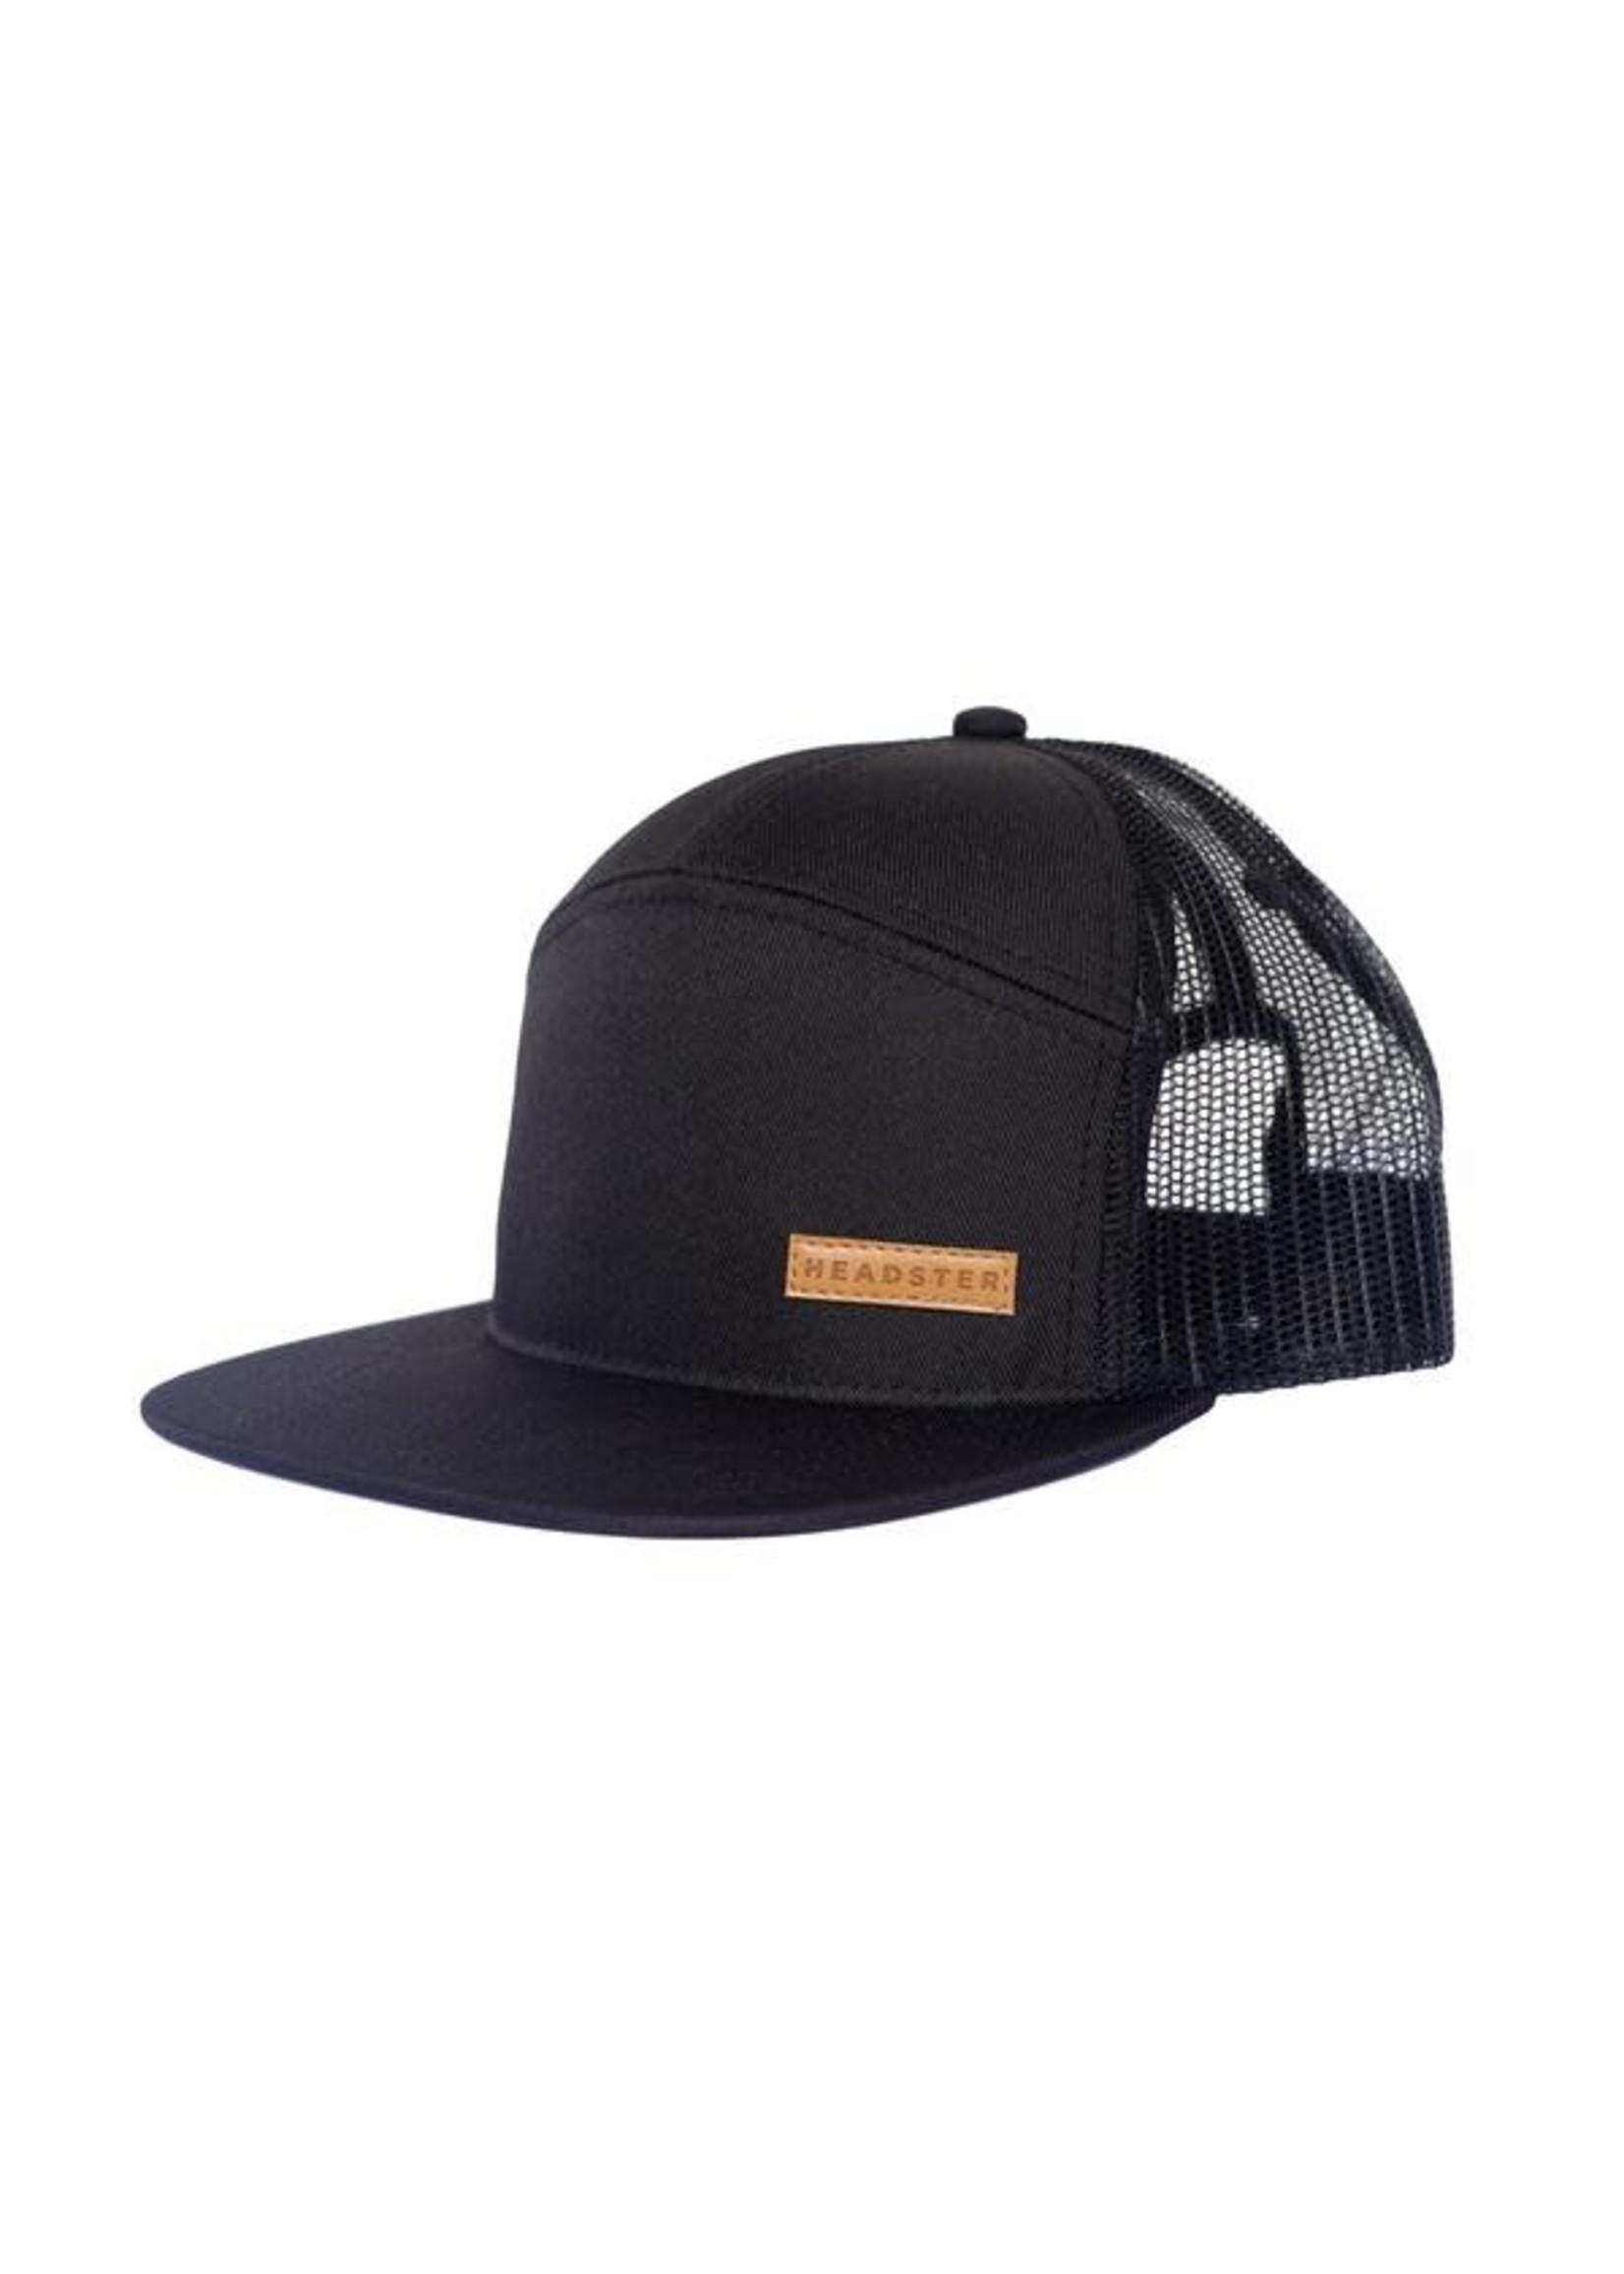 Headster Cap (City Black)